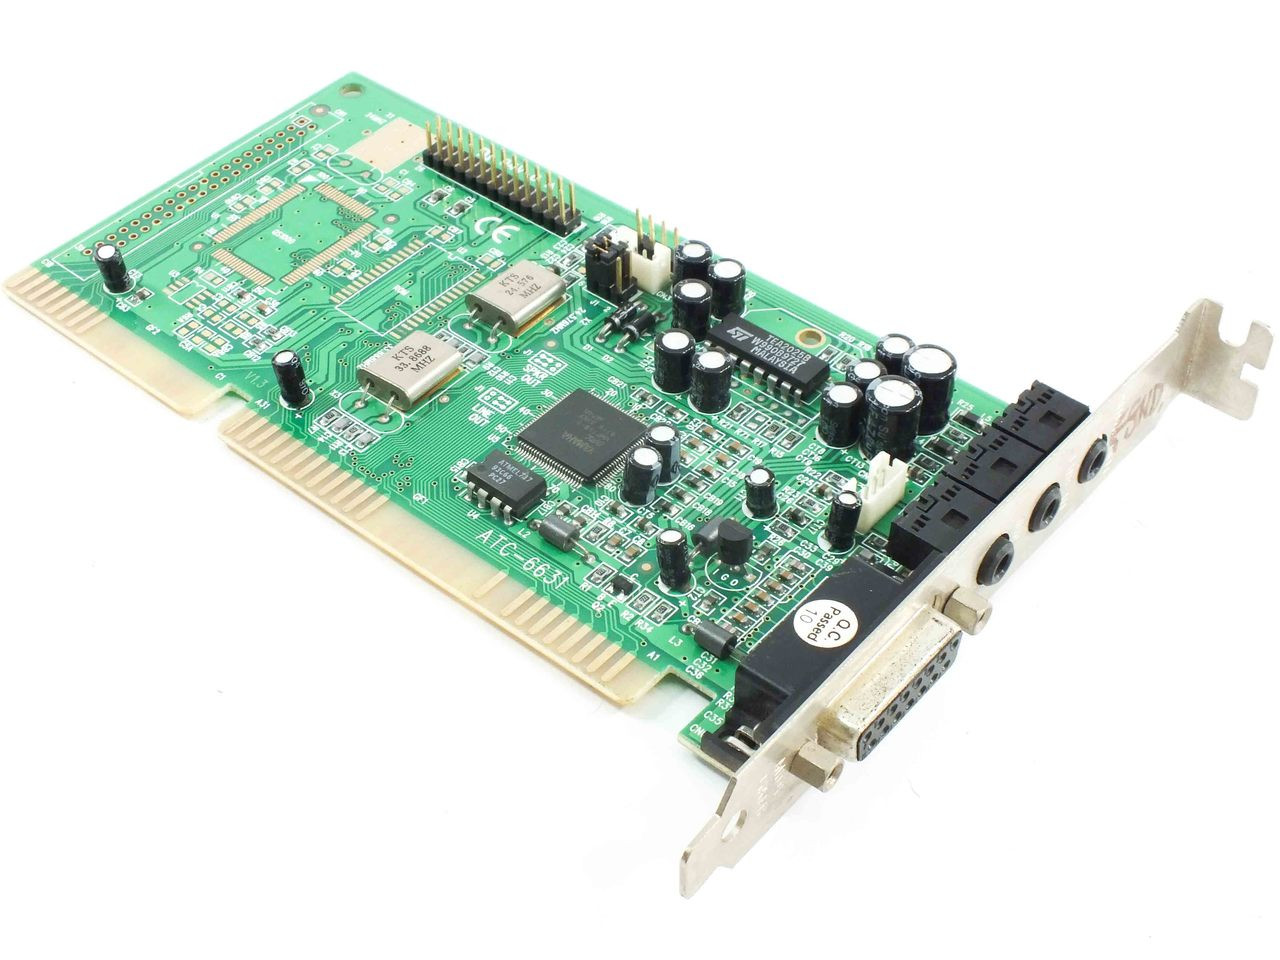 Yamaha ATC-6631 16-Bit ISA Sound Card OPL YMF719 Chip with Game Port